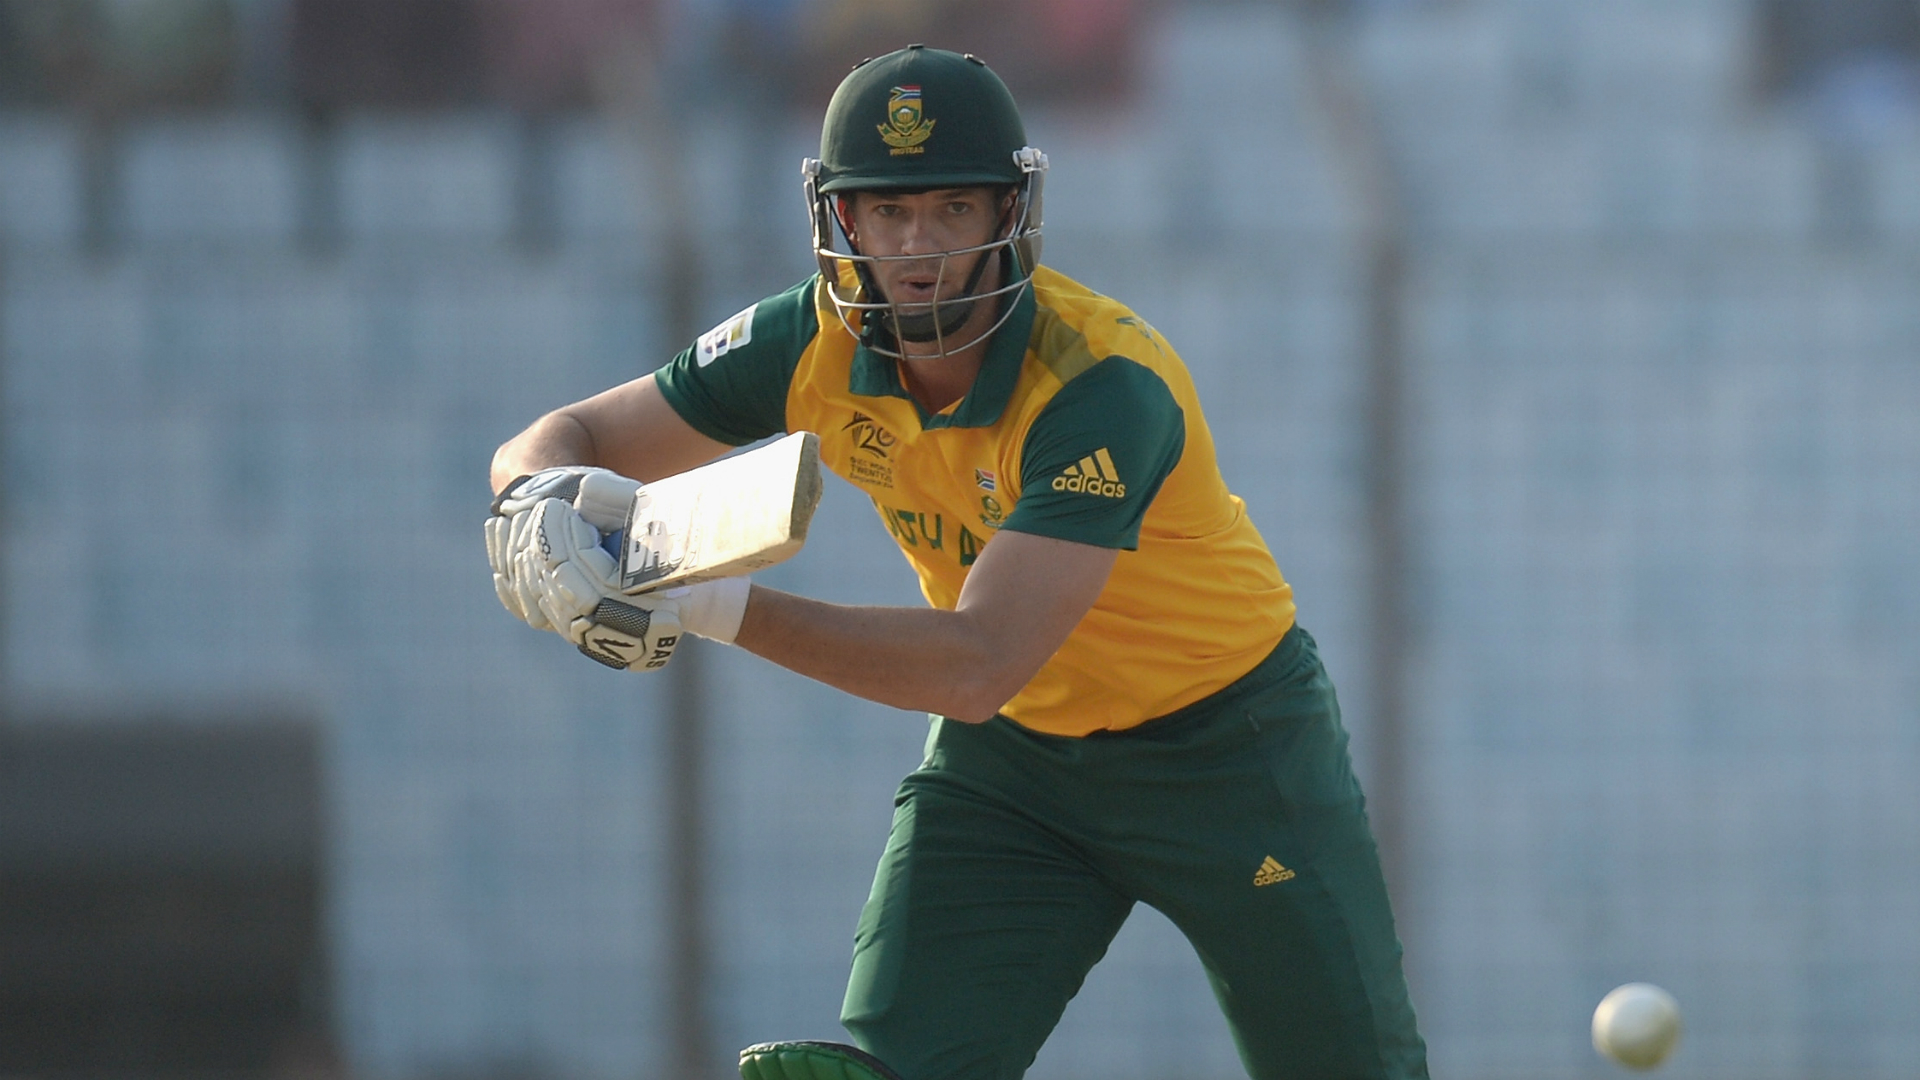 Albie Morkel calls time on cricket career